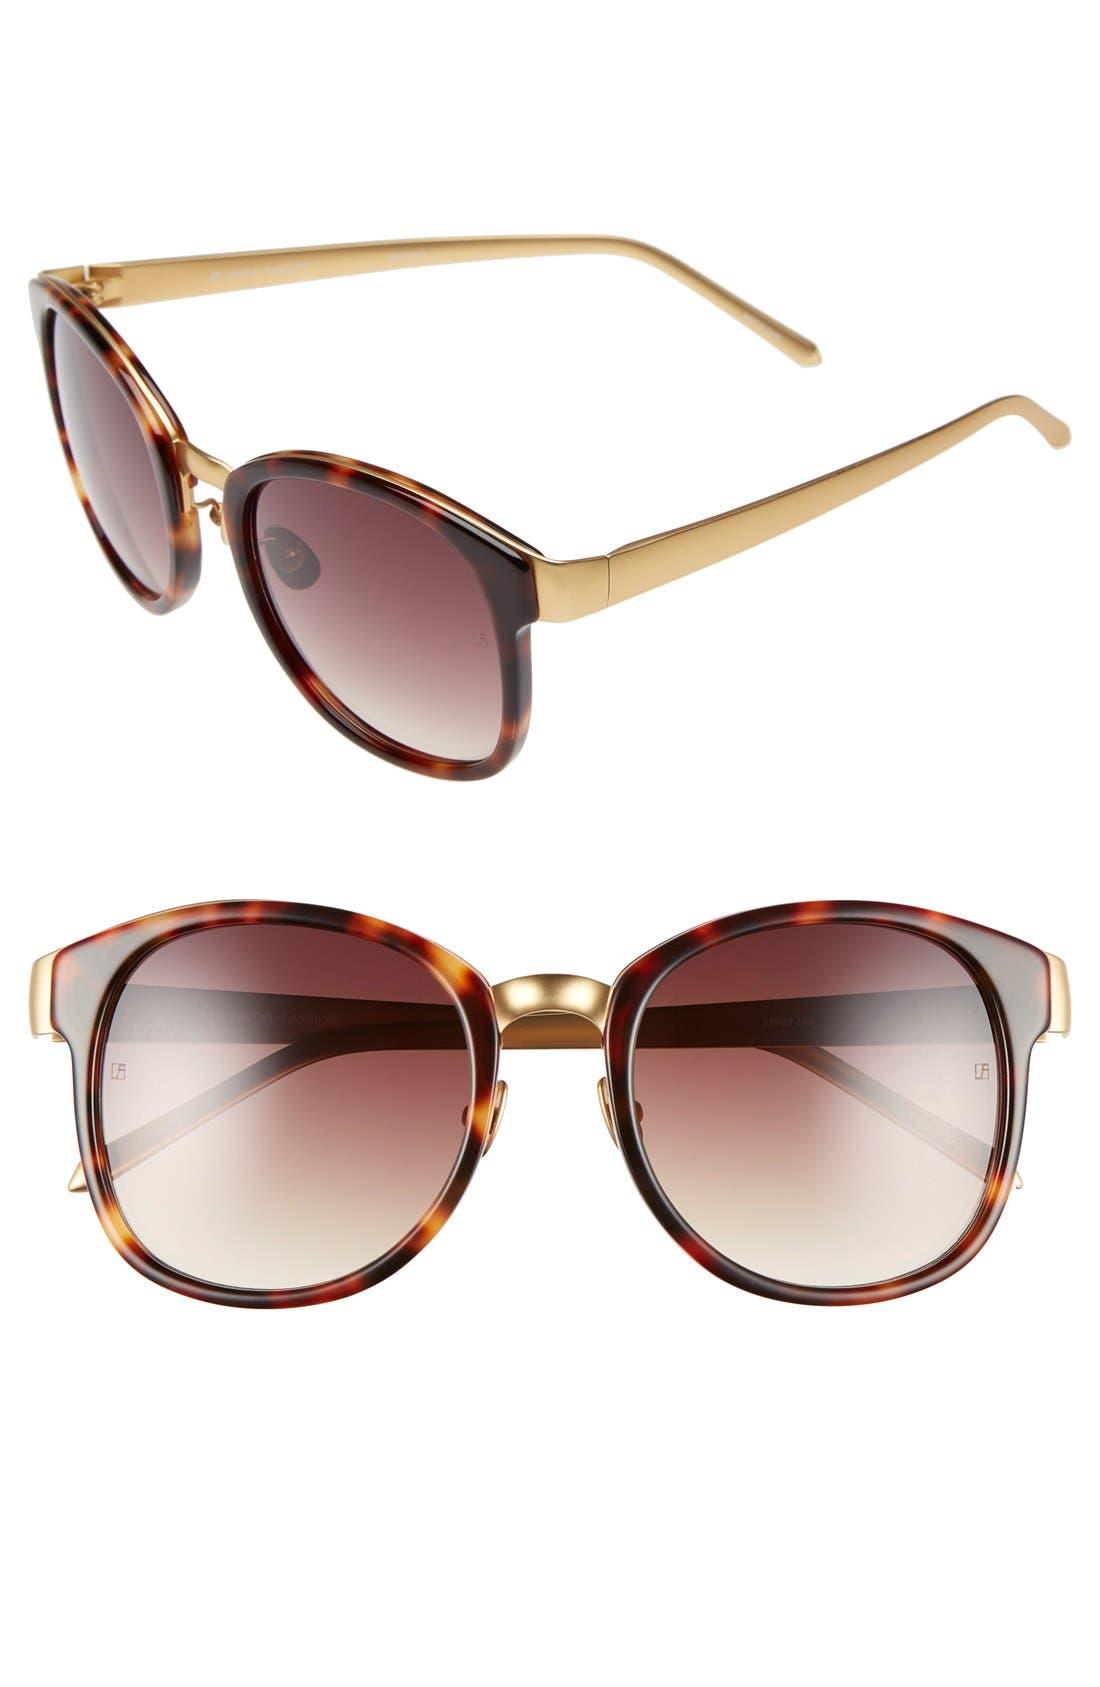 D-Frame 52mm 24 Karat Gold Trim Sunglasses,                         Main,                         color, 200